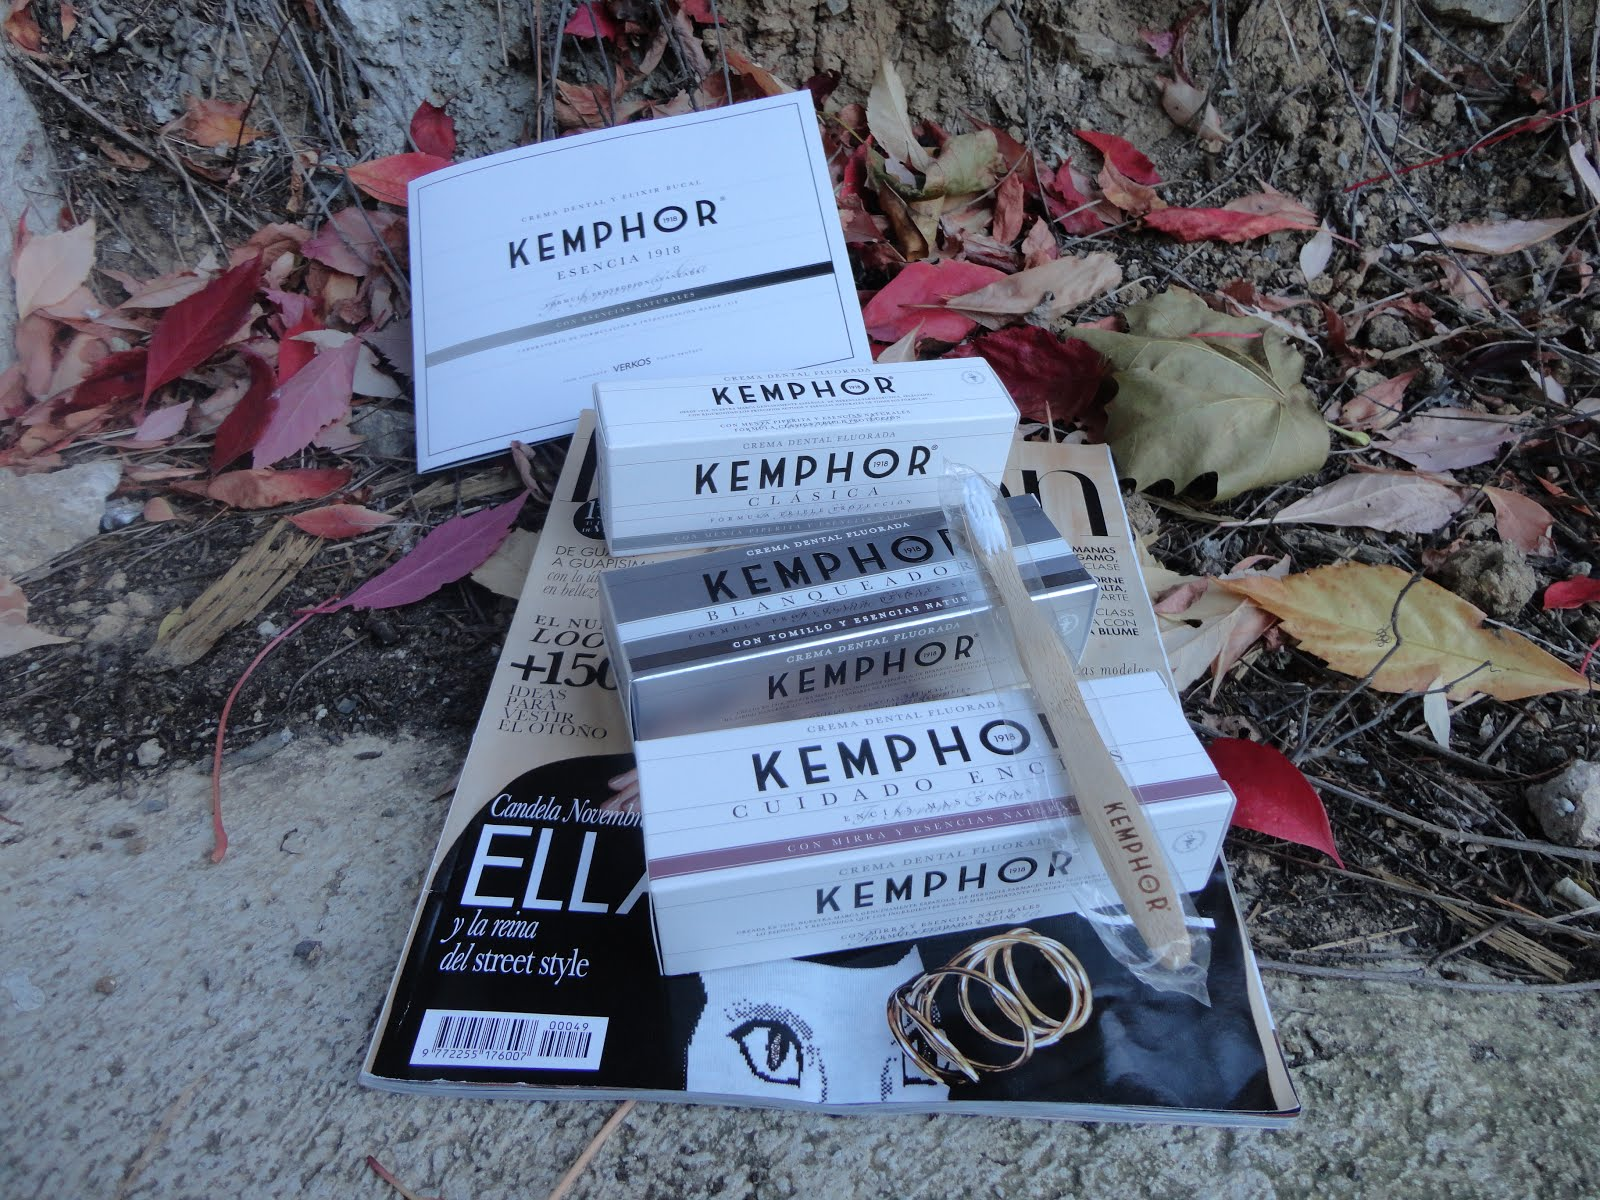 Sorteo de lote de Esencia 1918 de Kemphor